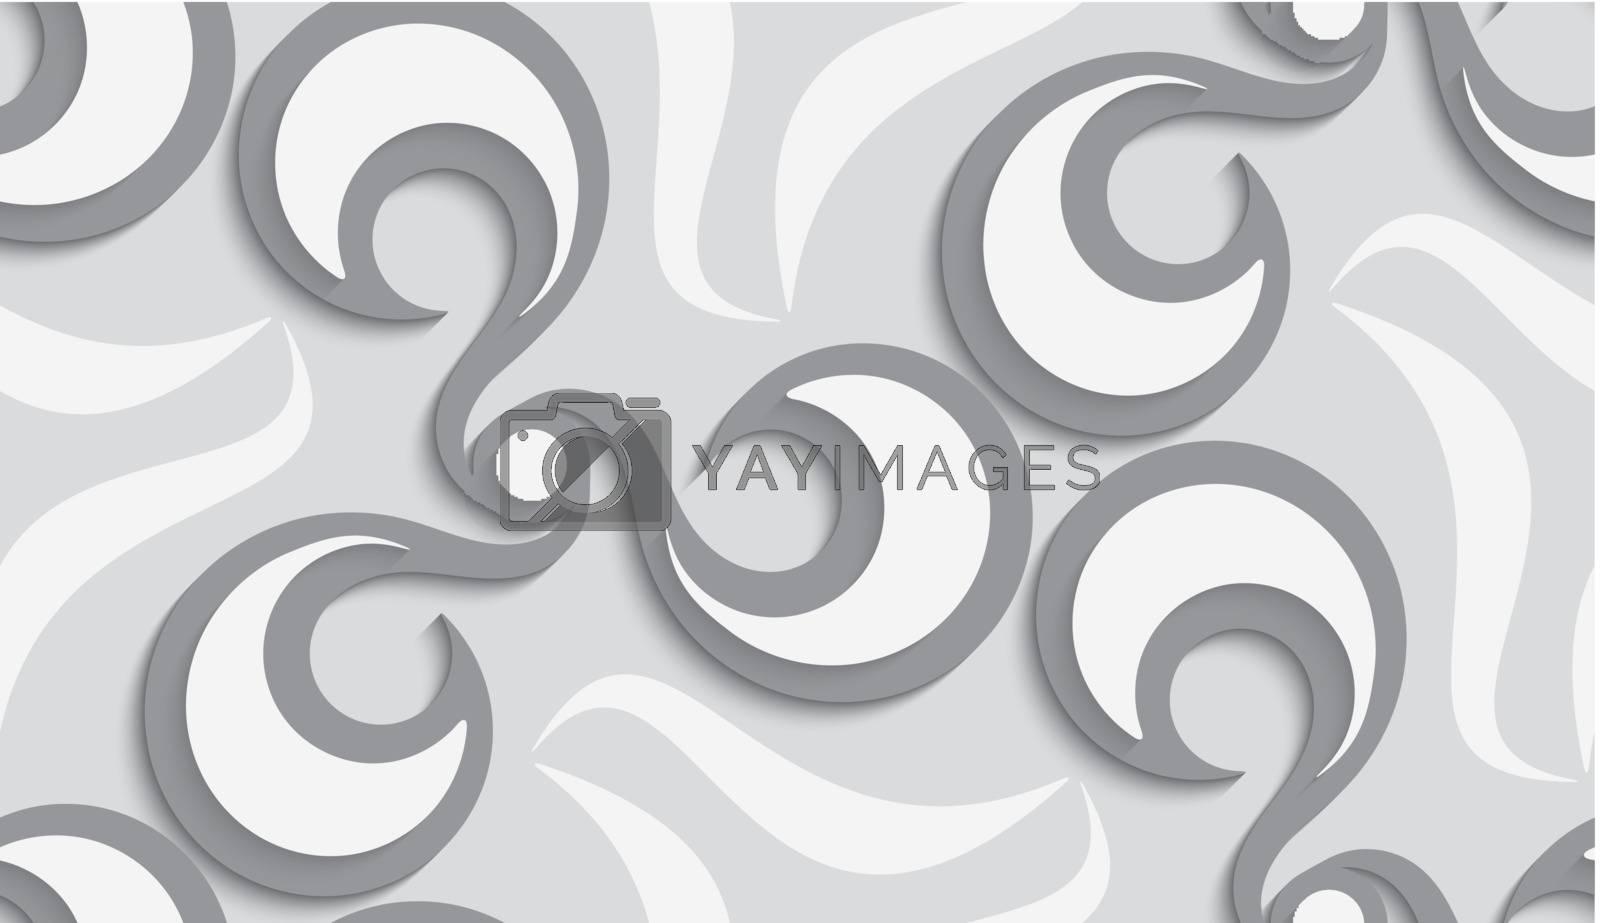 Seamless floral swirls by Zebra-Finch